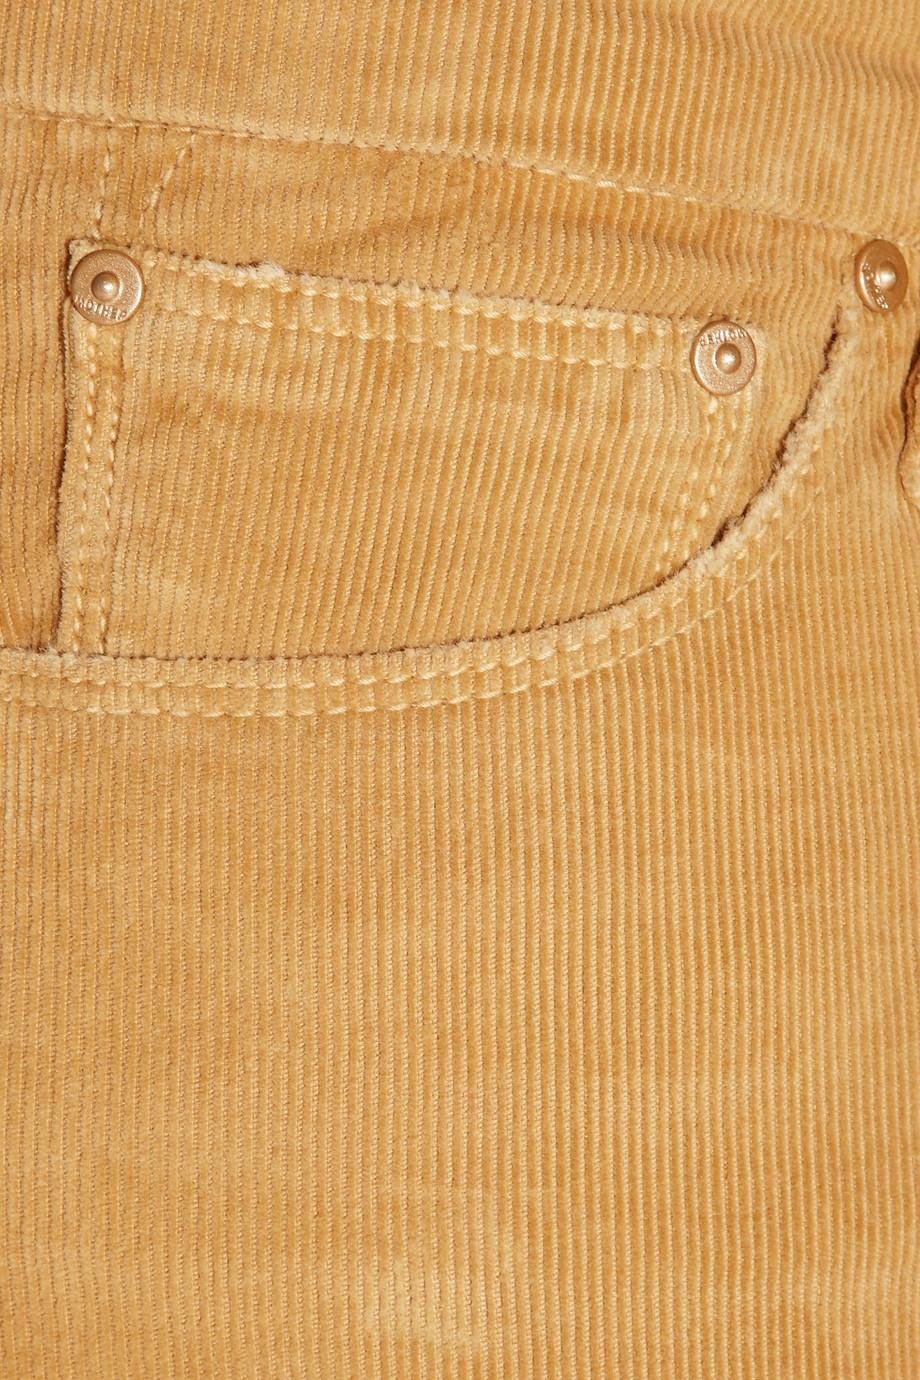 Mother The Looker Lowrise Corduroy Skinny Jeans in Saffron (Orange)